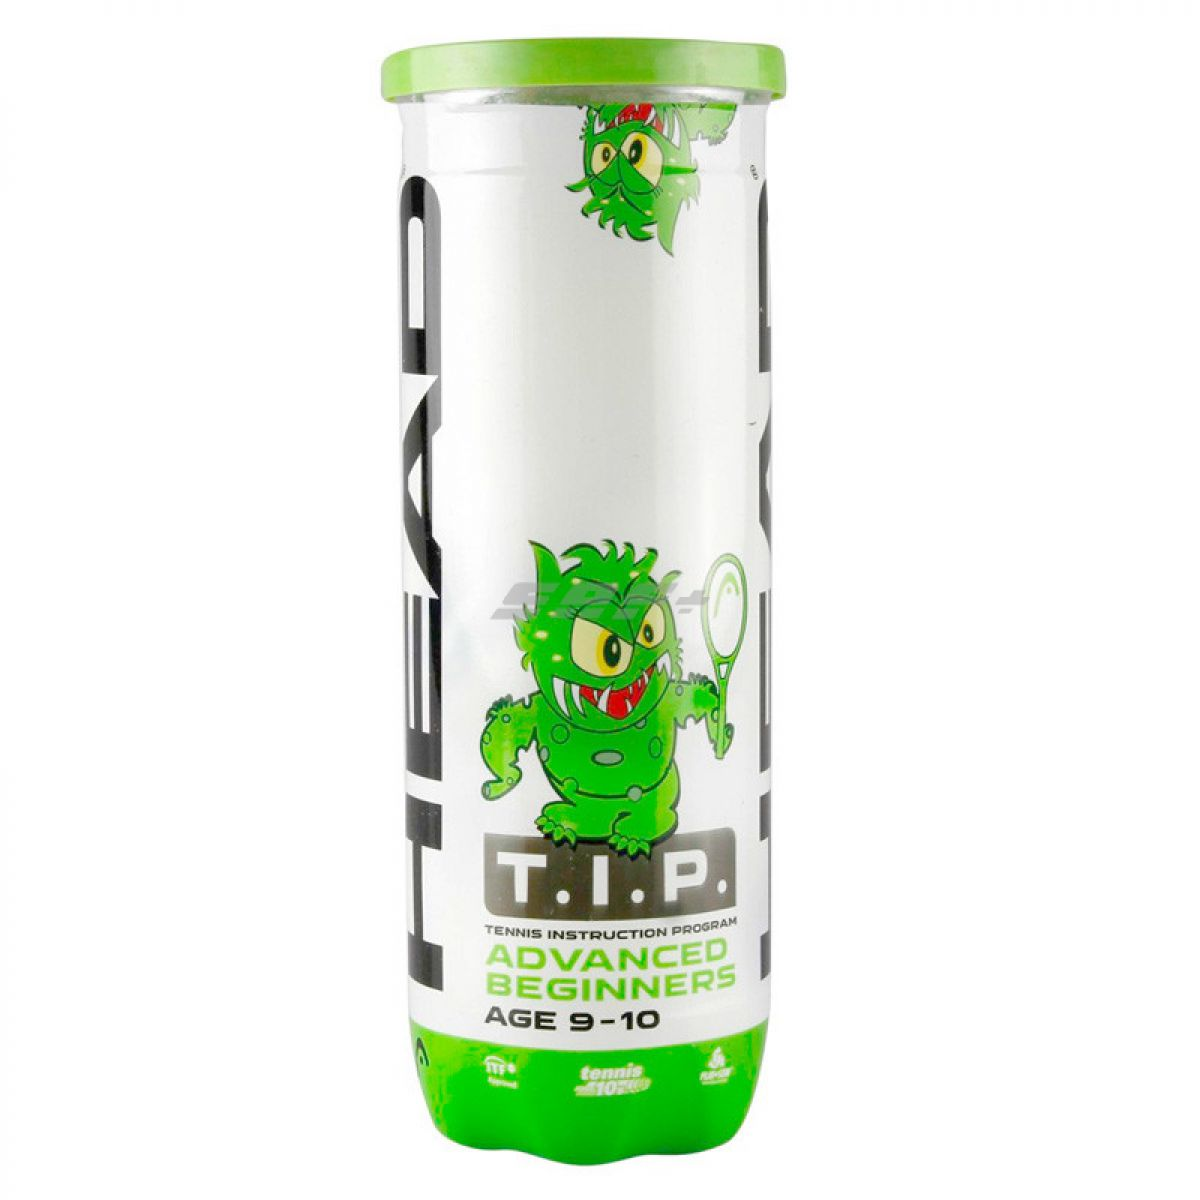 Мяч теннисный Мяч теннисный HEAD T.I.P Green, арт.578133,уп.3 шт, фетр,нат.резина,желто-зеленый